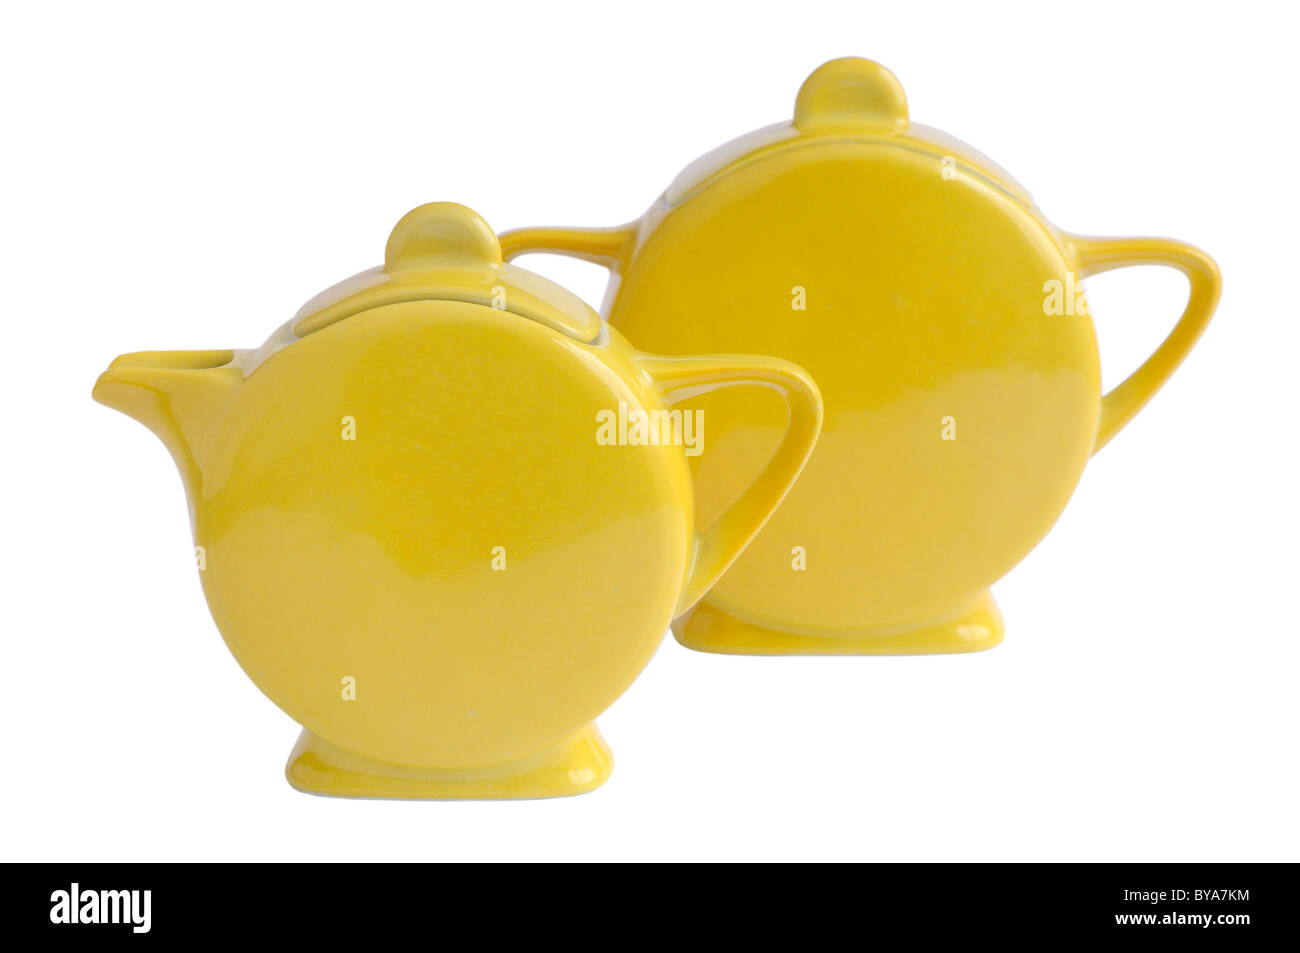 Art Deco Limoges teapot and sugar bowl - Stock Image